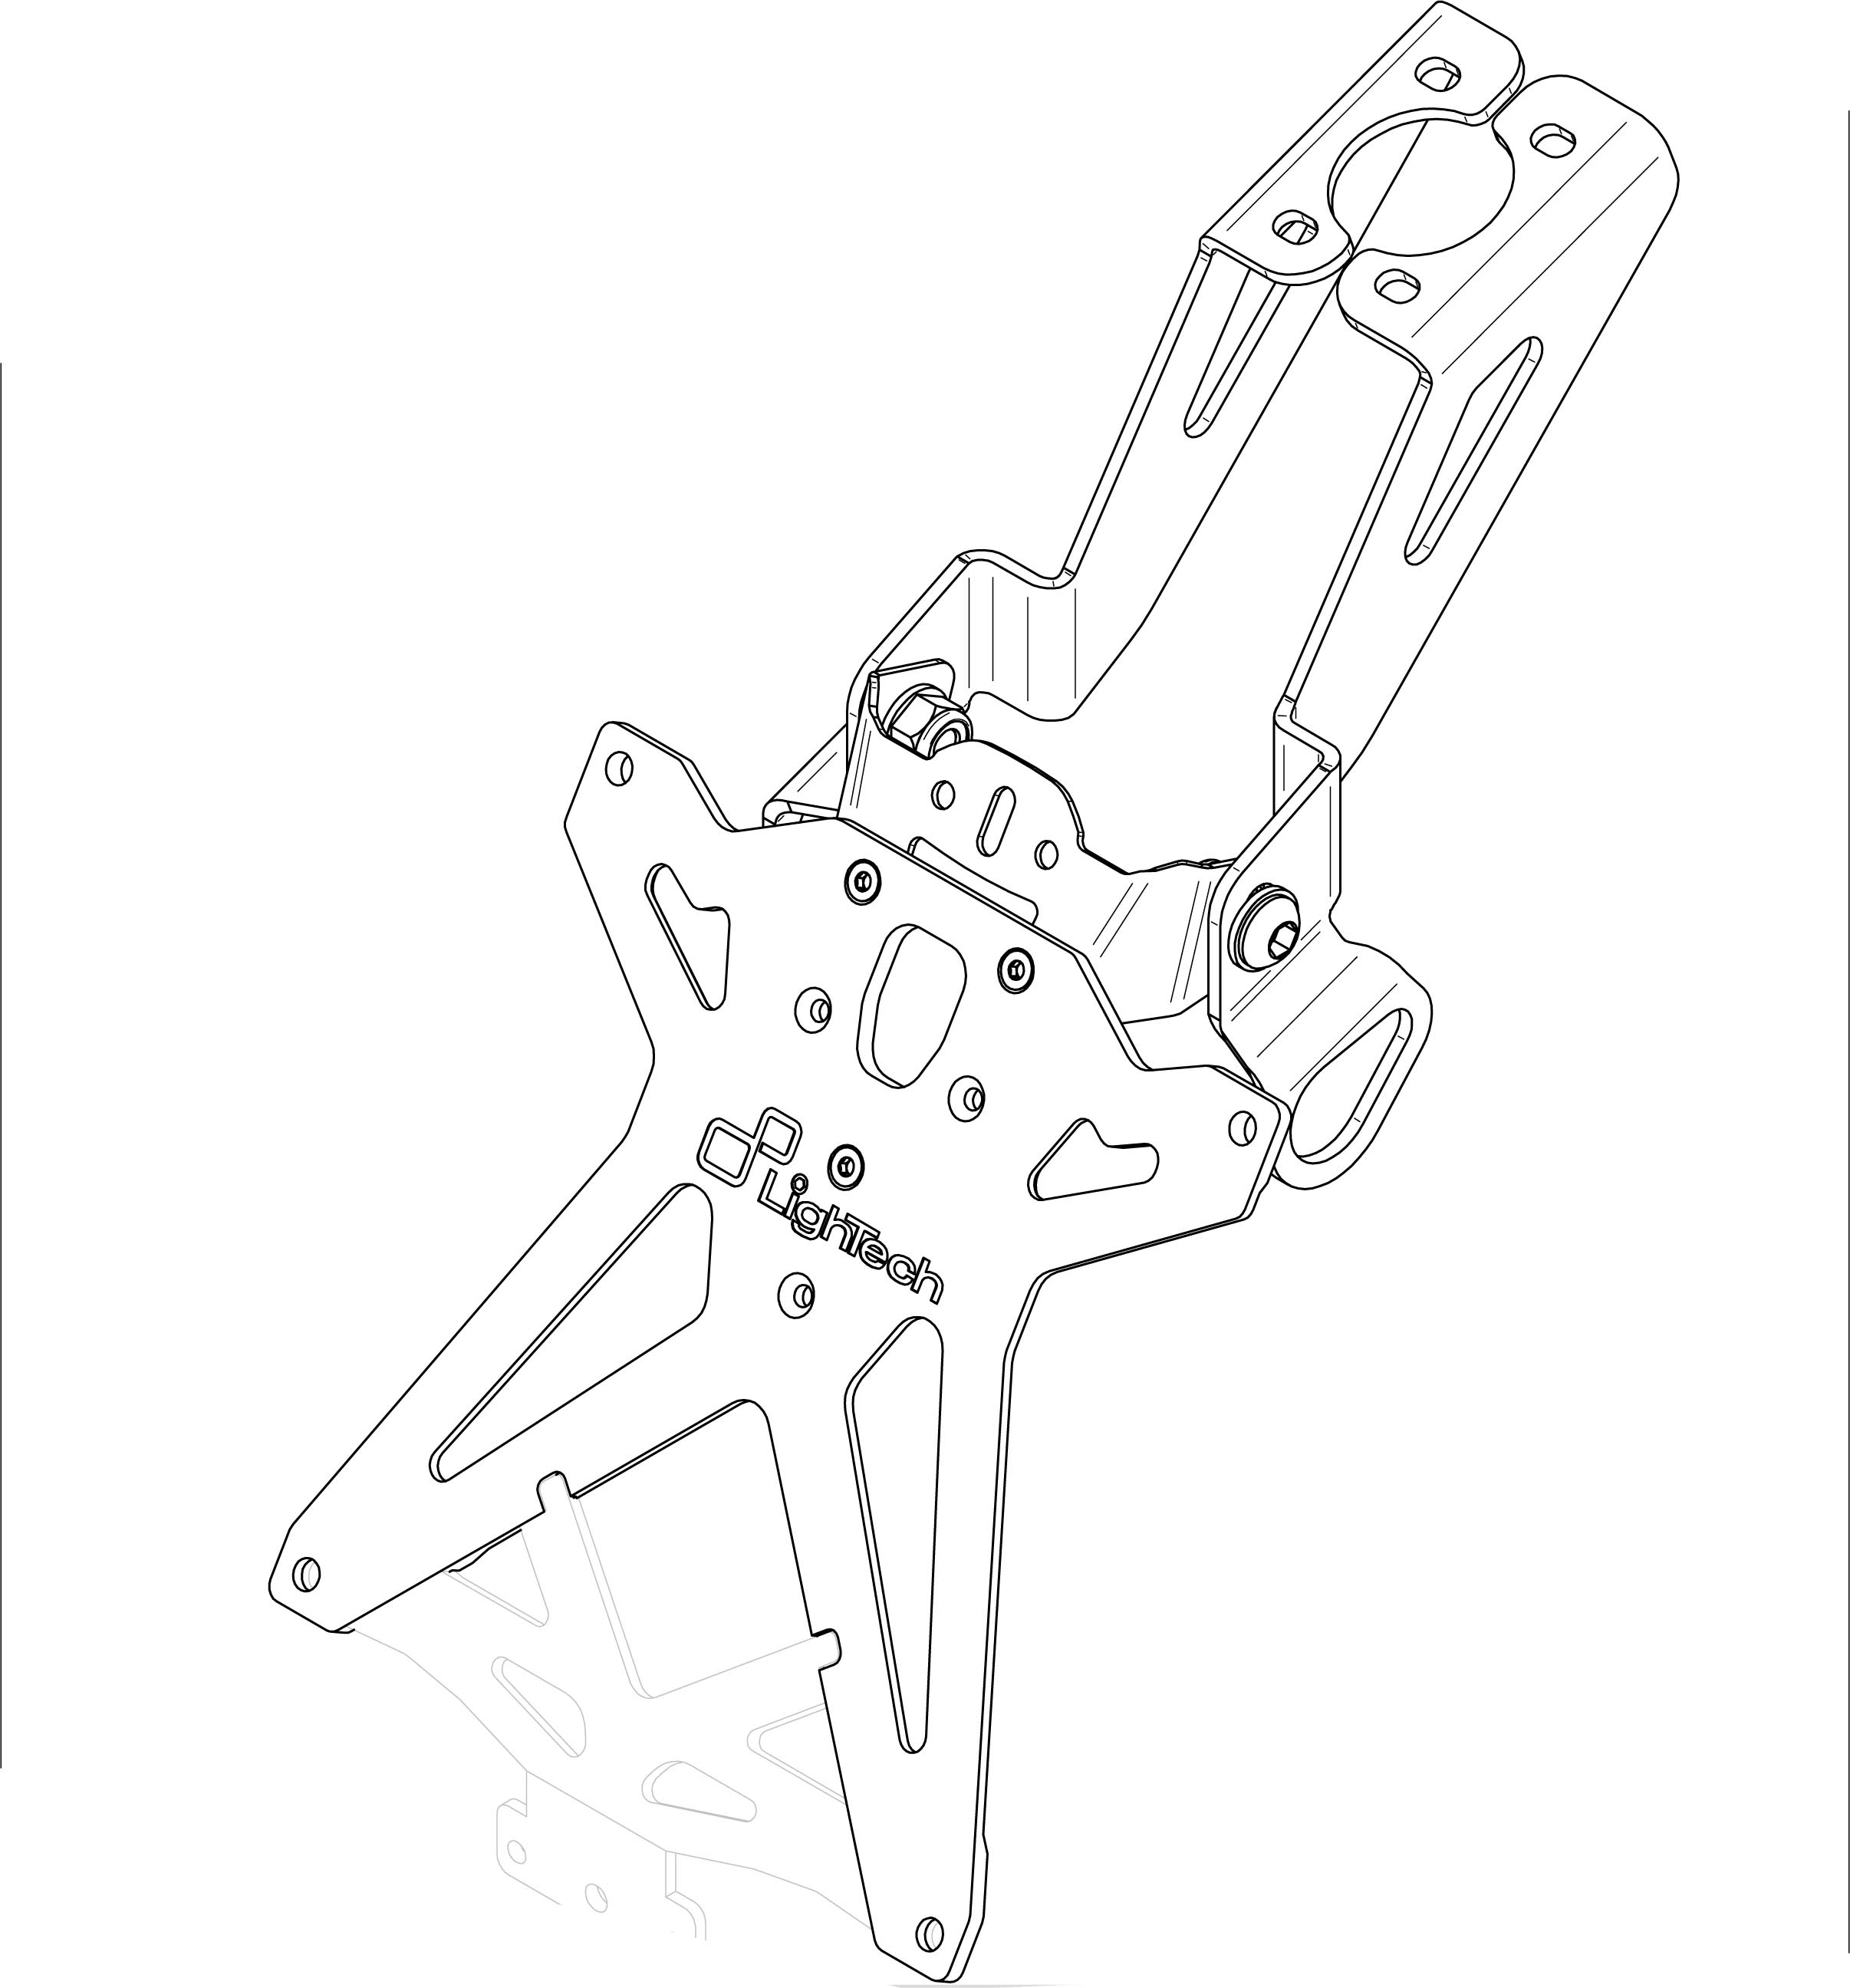 Portamatrículas Lightech para Yamaha R6 06-15 / R1 04-08 Intermitentes Originales